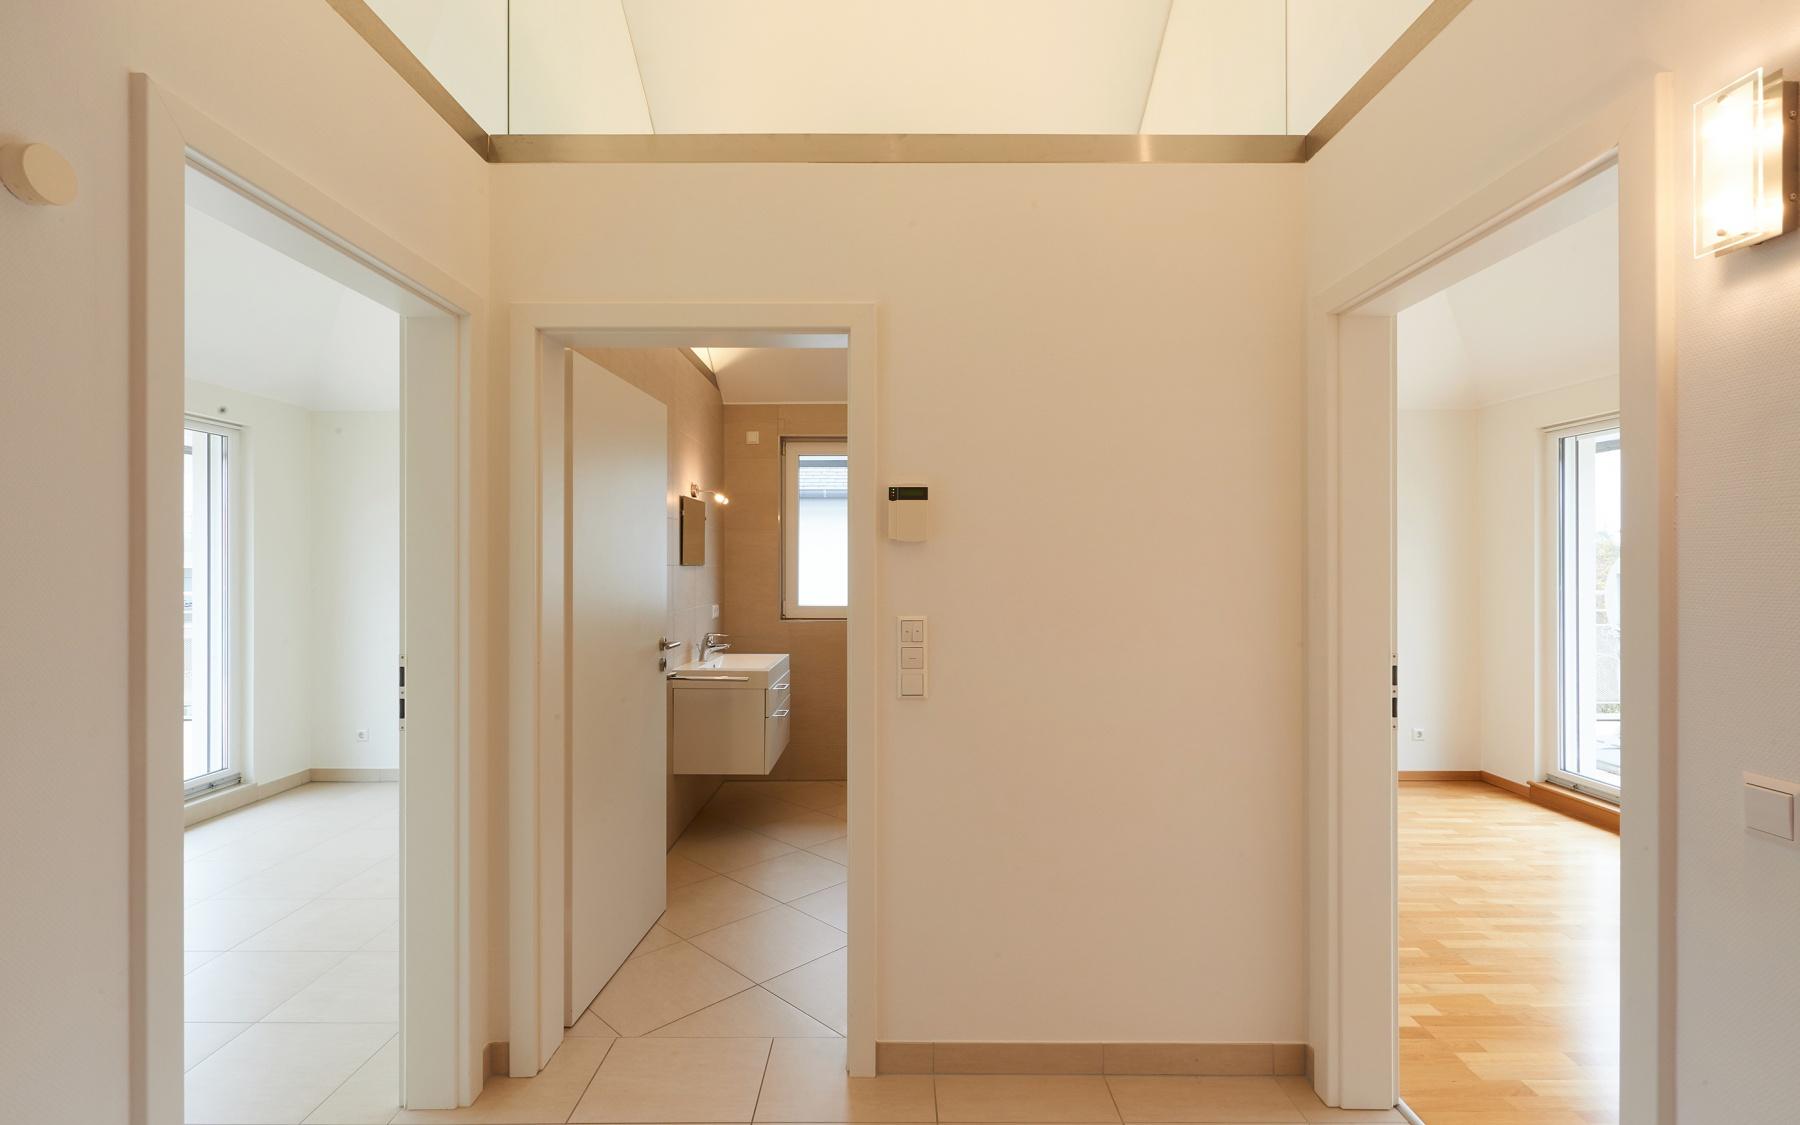 Maison moderne à Luxembourg-Cents